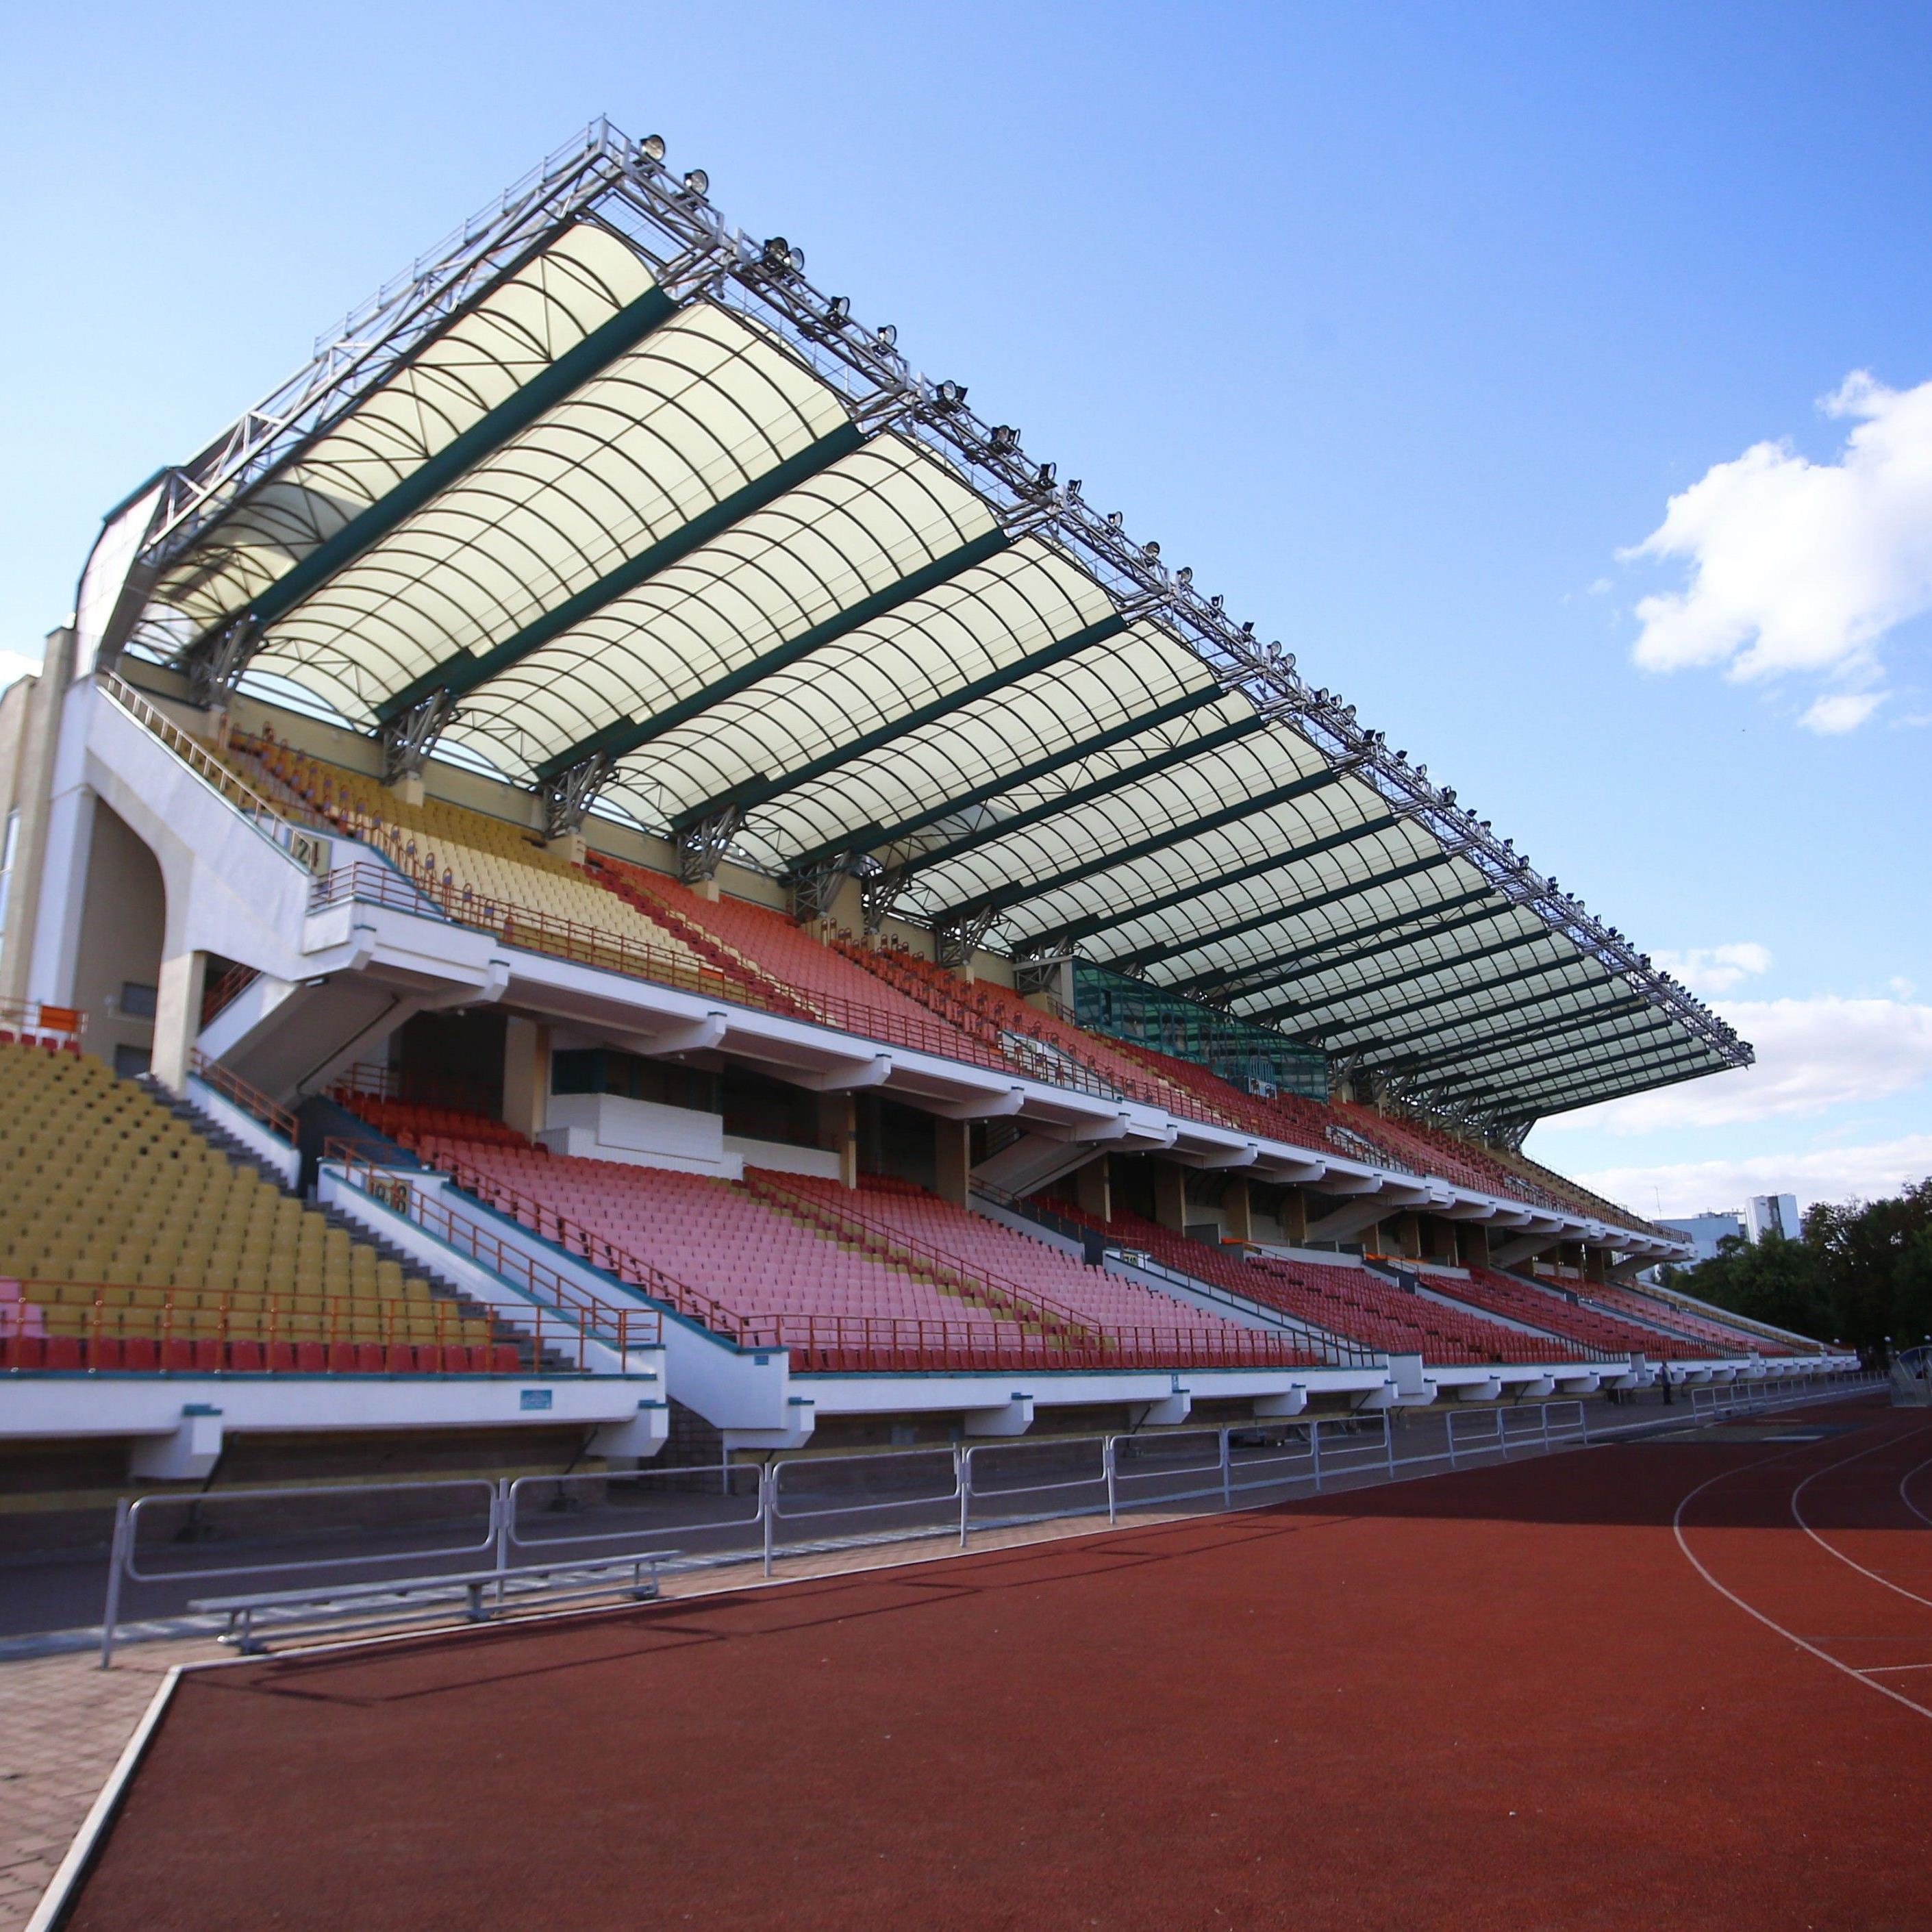 Das DASK Brestski, Heimstätte des FC Dynamo Brest.